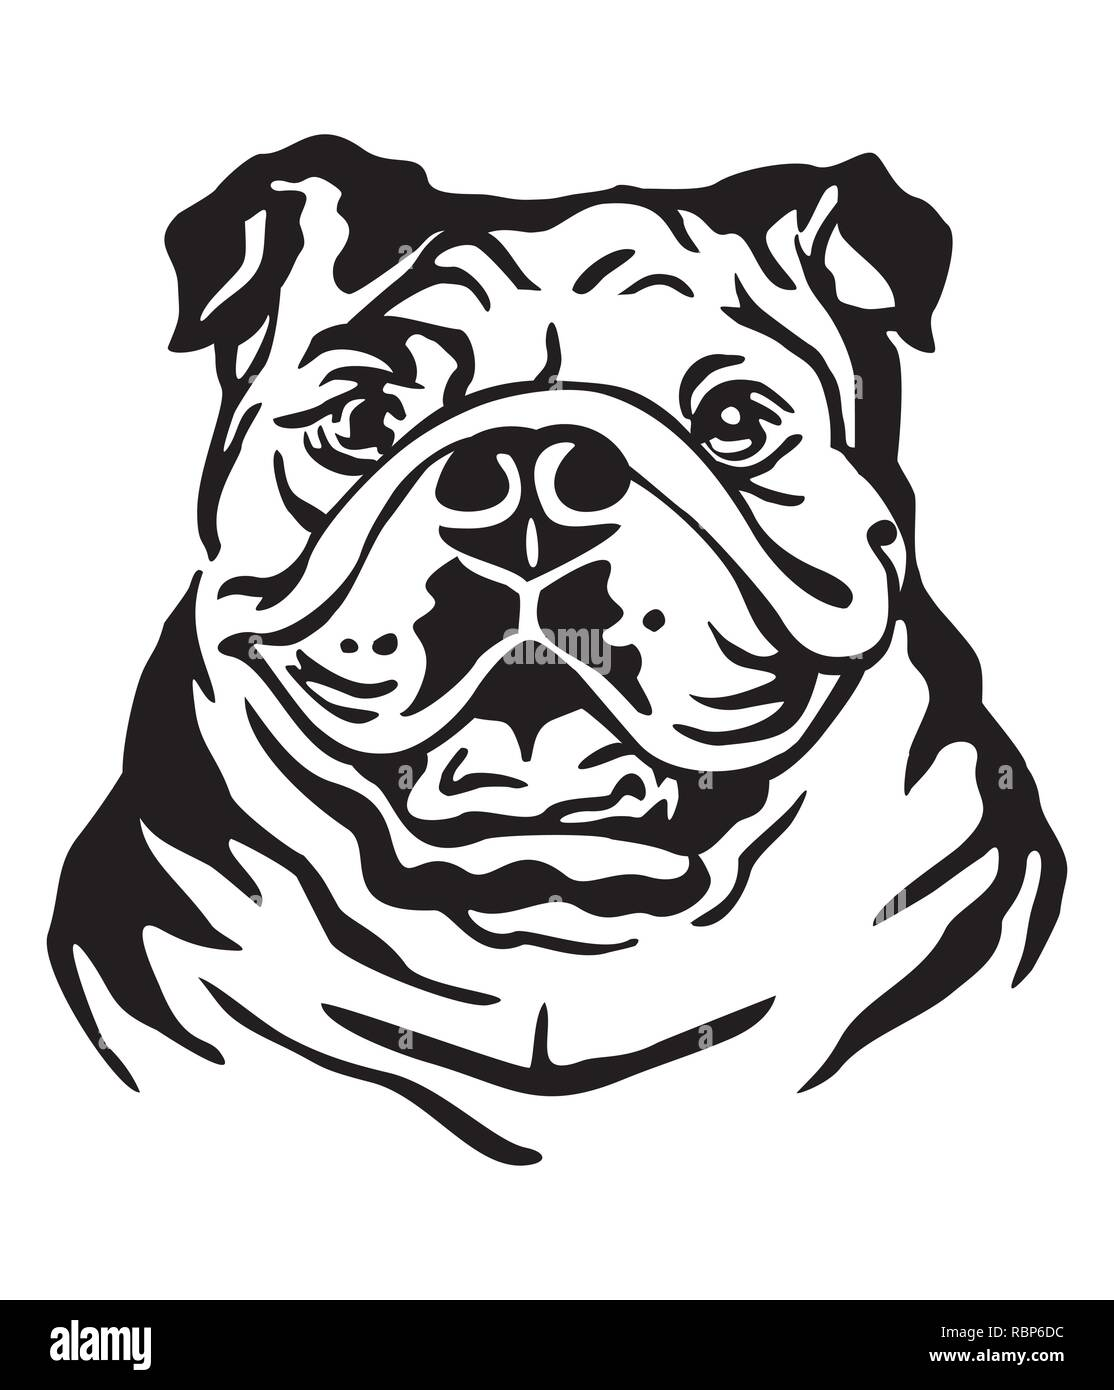 Bulldog Tattoo Stock Photos & Bulldog Tattoo Stock Images - Alamy